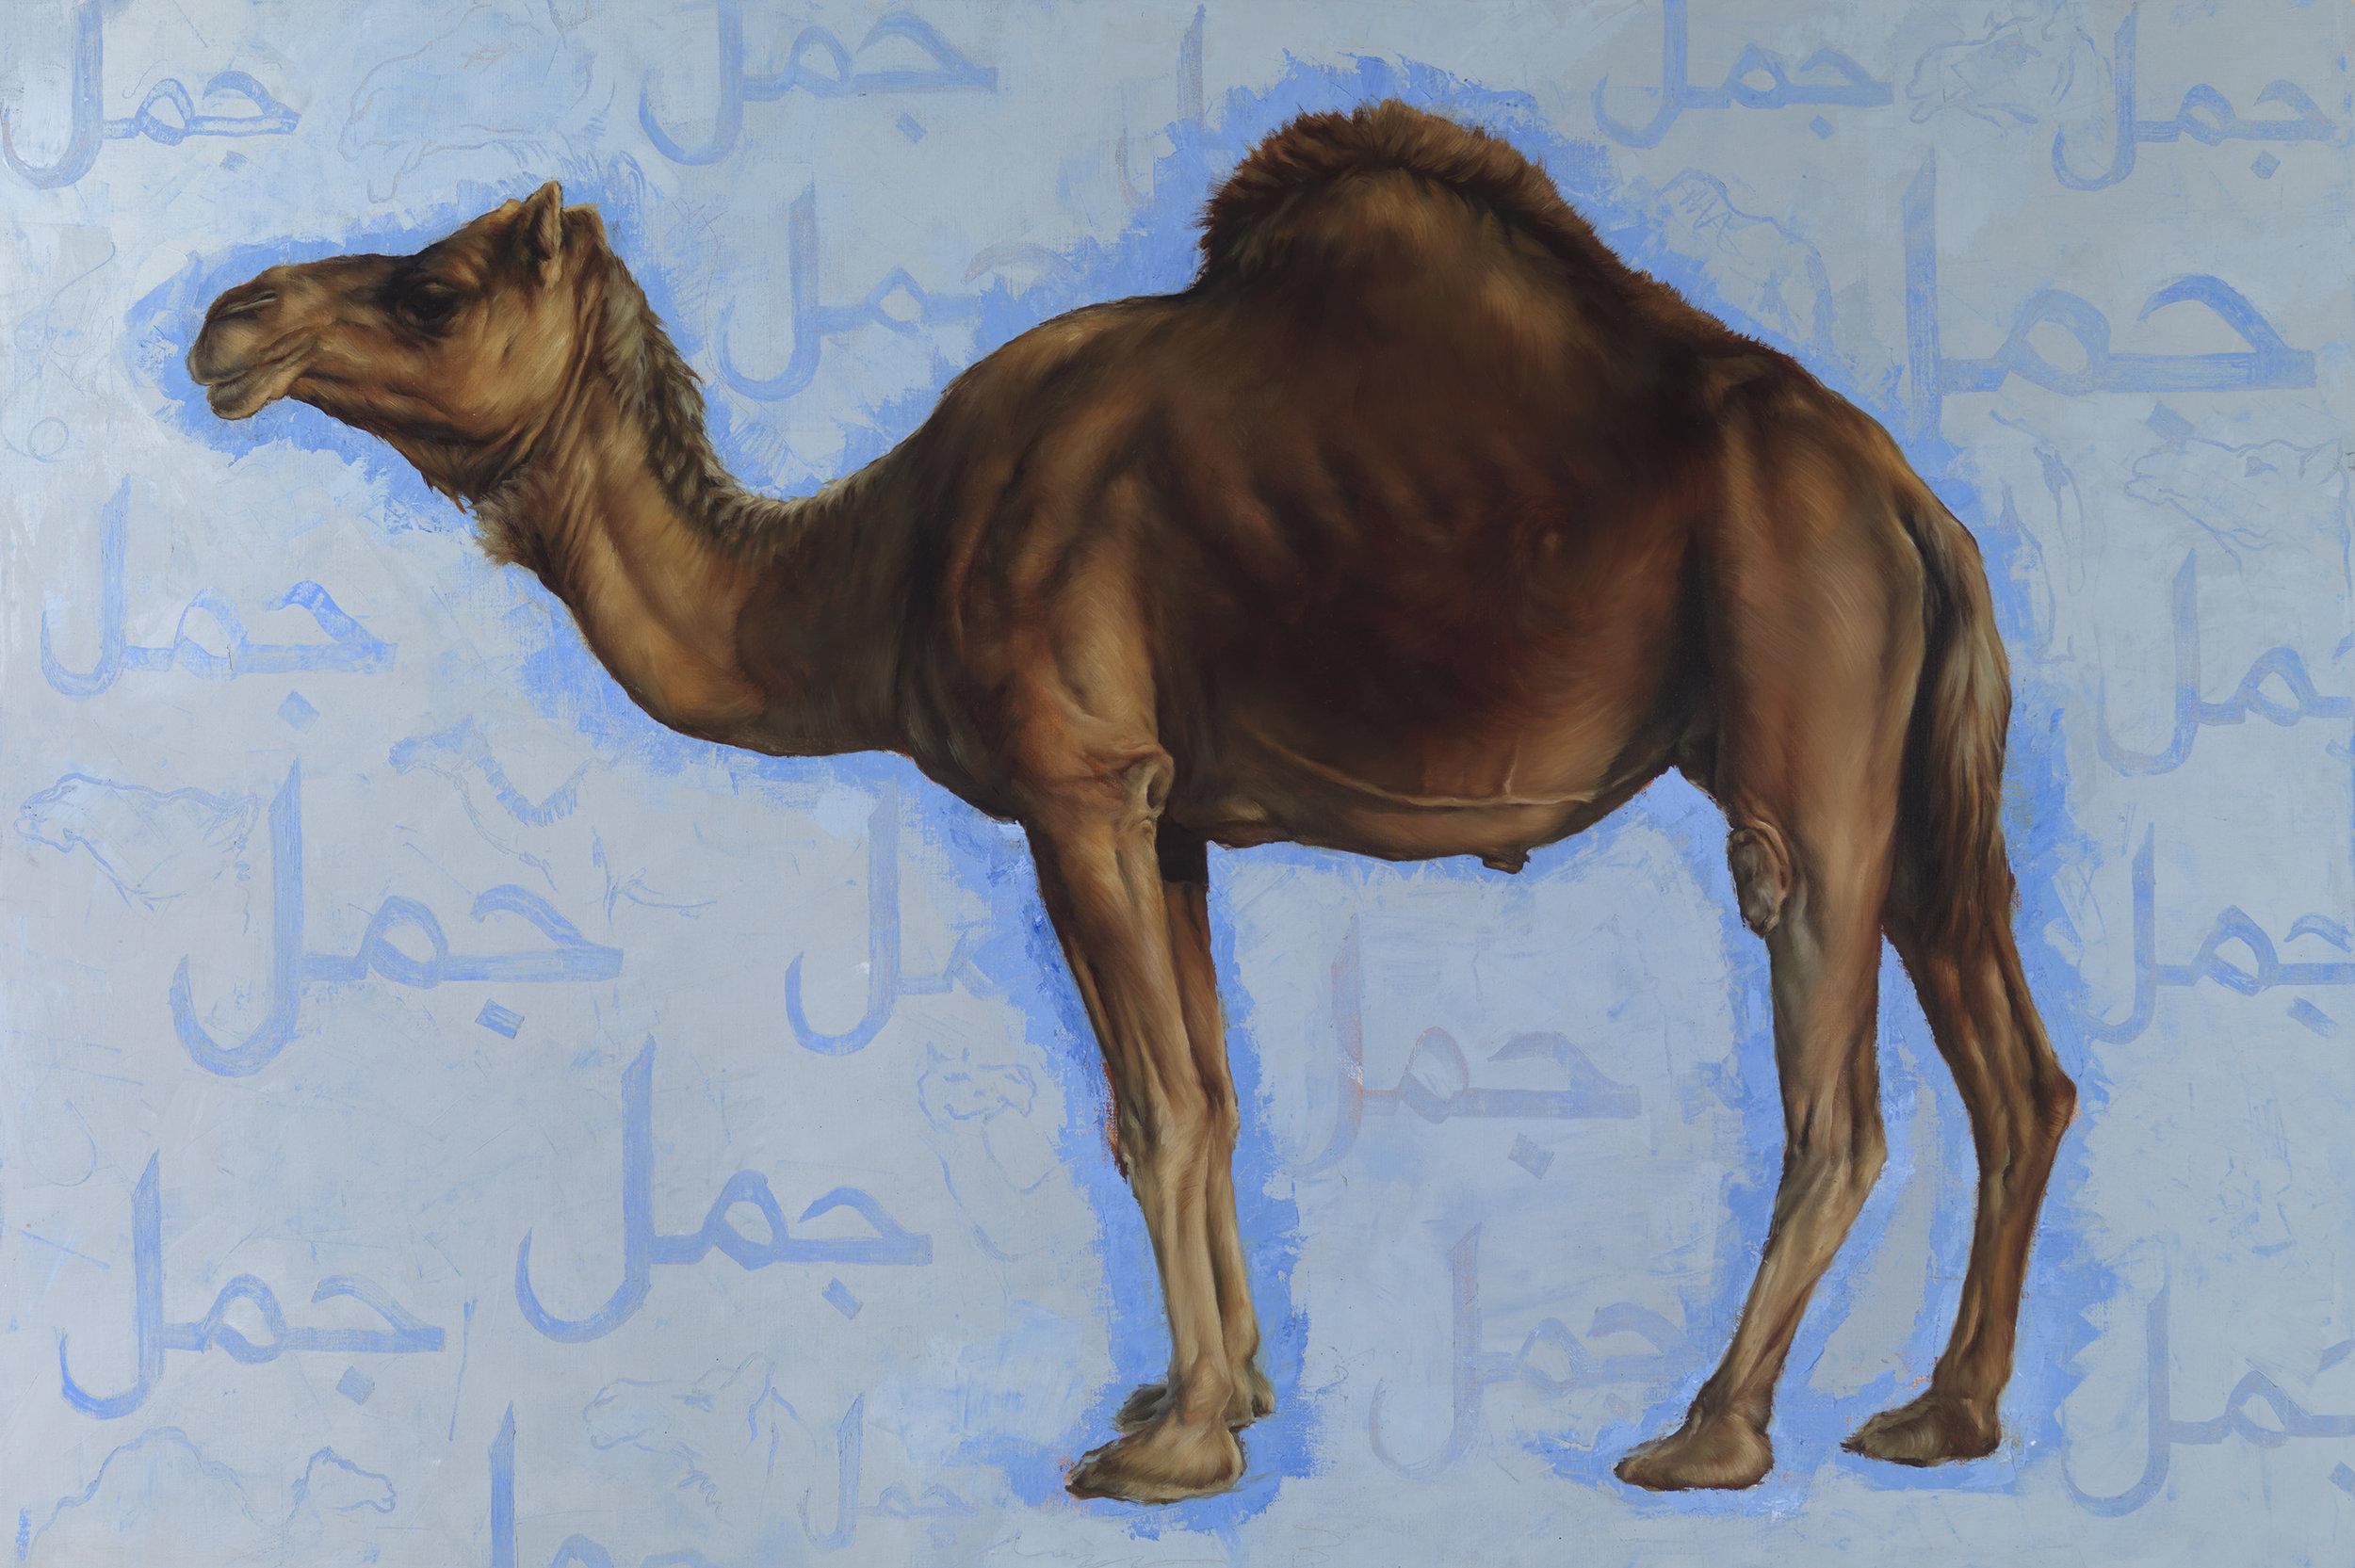 Camel_100x150_3903.jpg